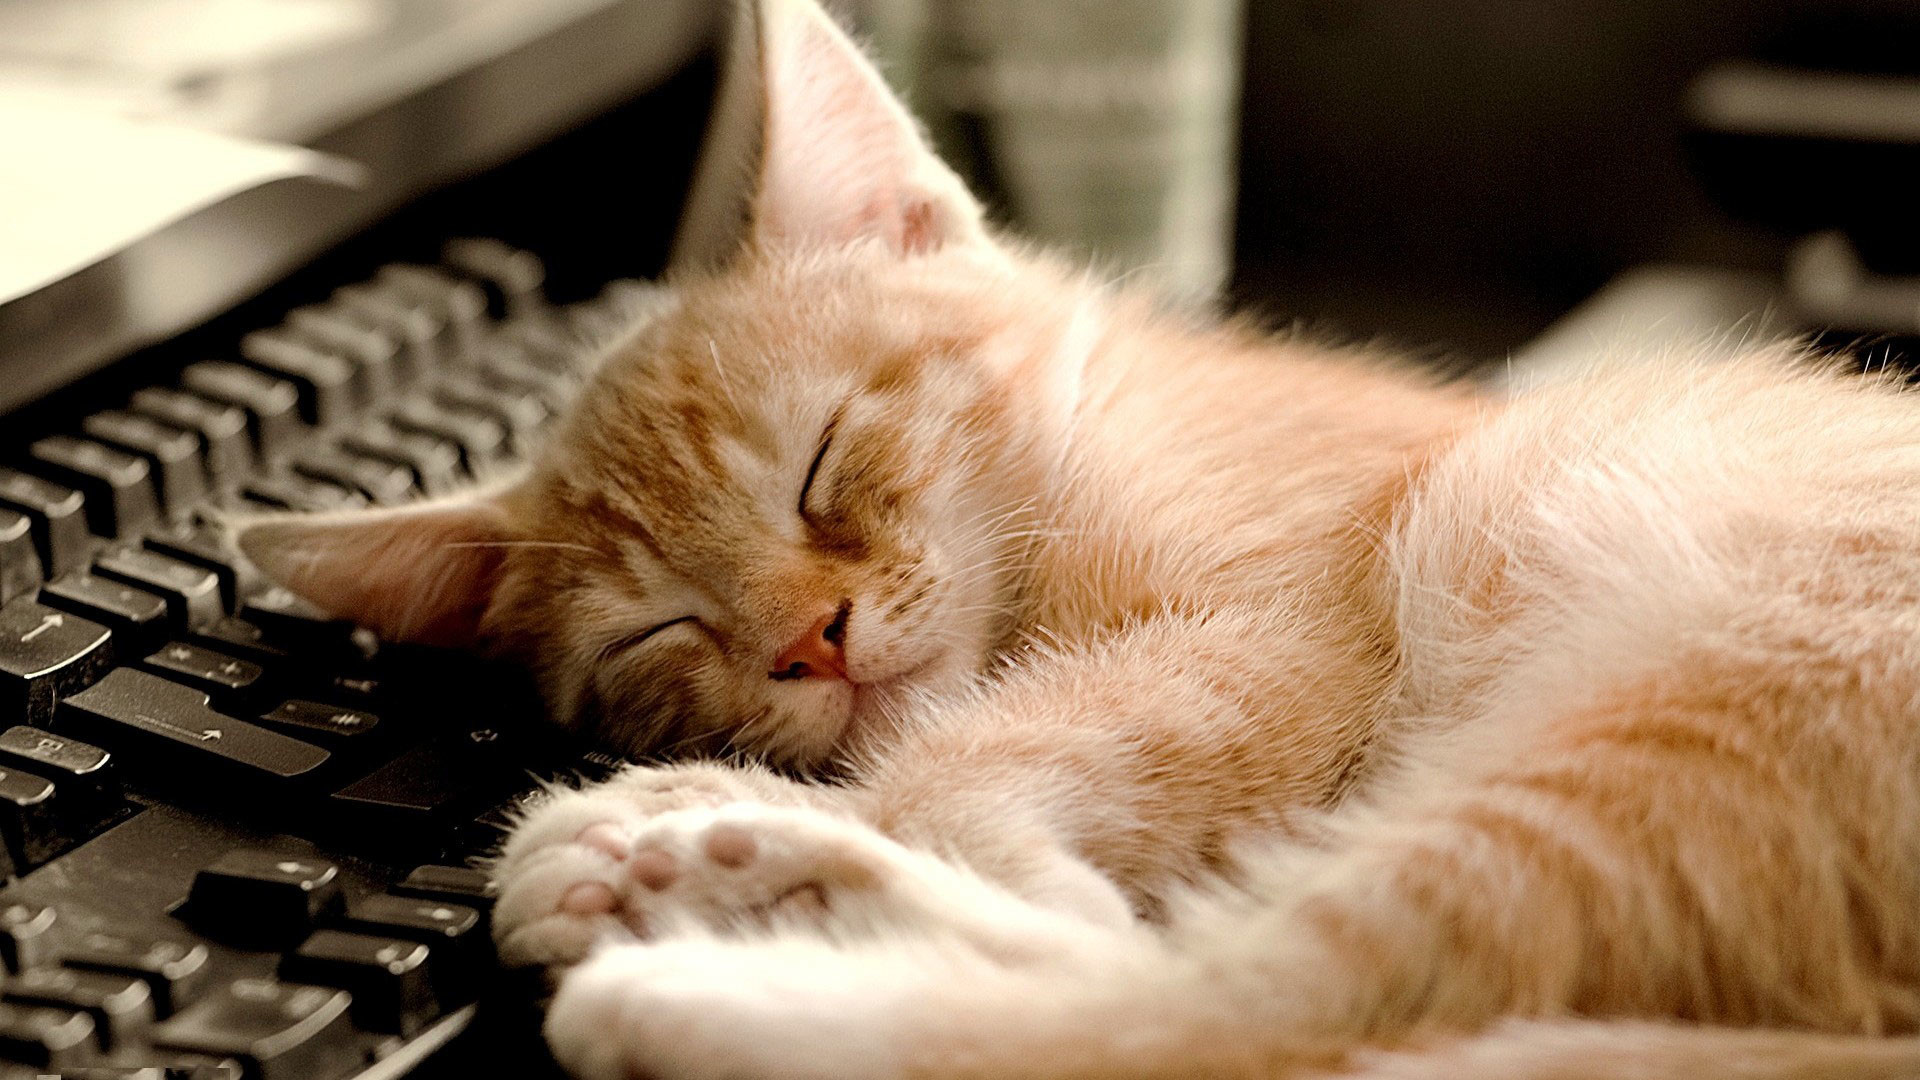 hd pics photos cute cat sleeping computer keyboard hd quality desktop  background wallpaper